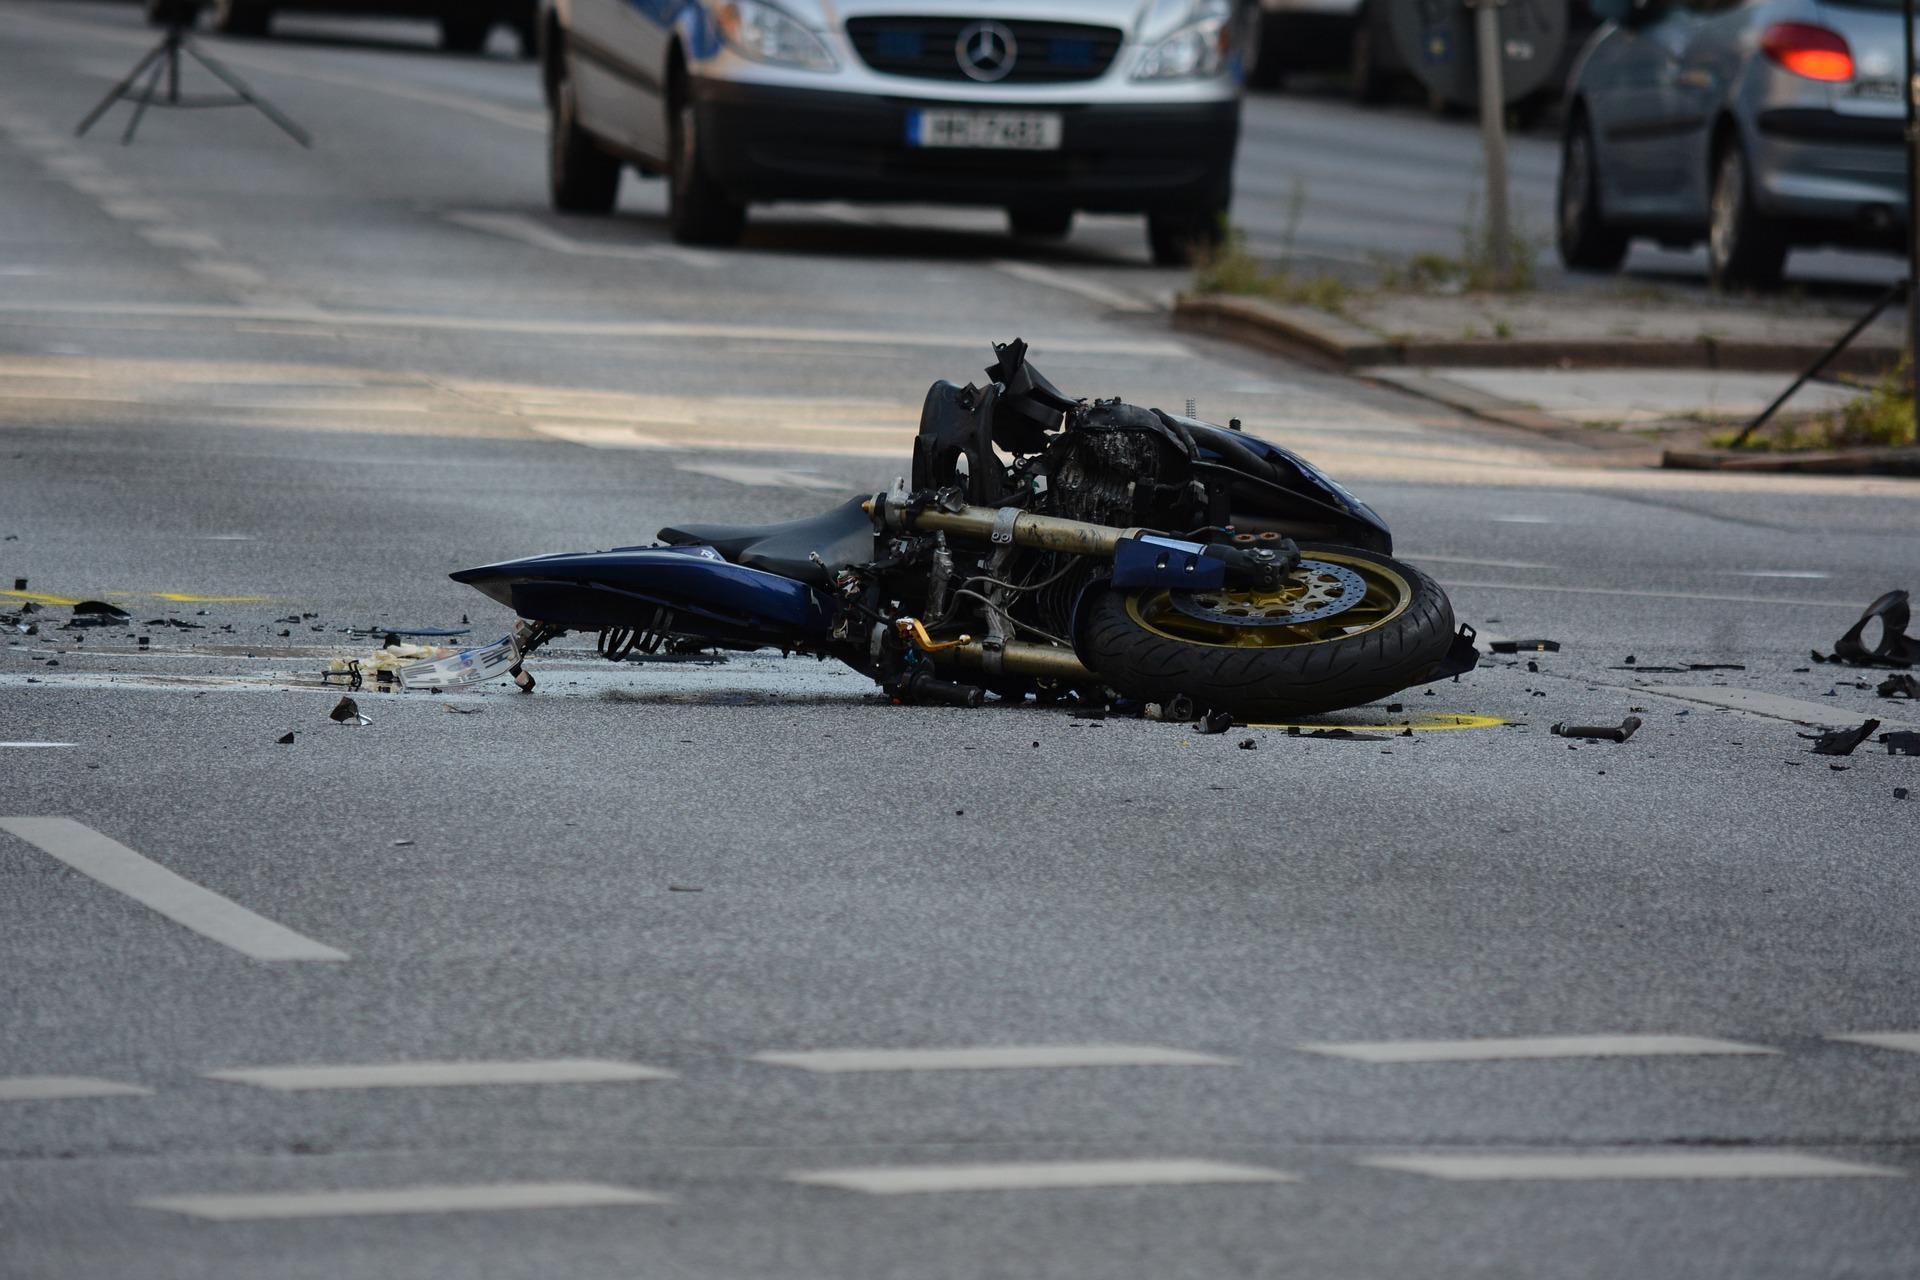 motorcycle accident needing attorney